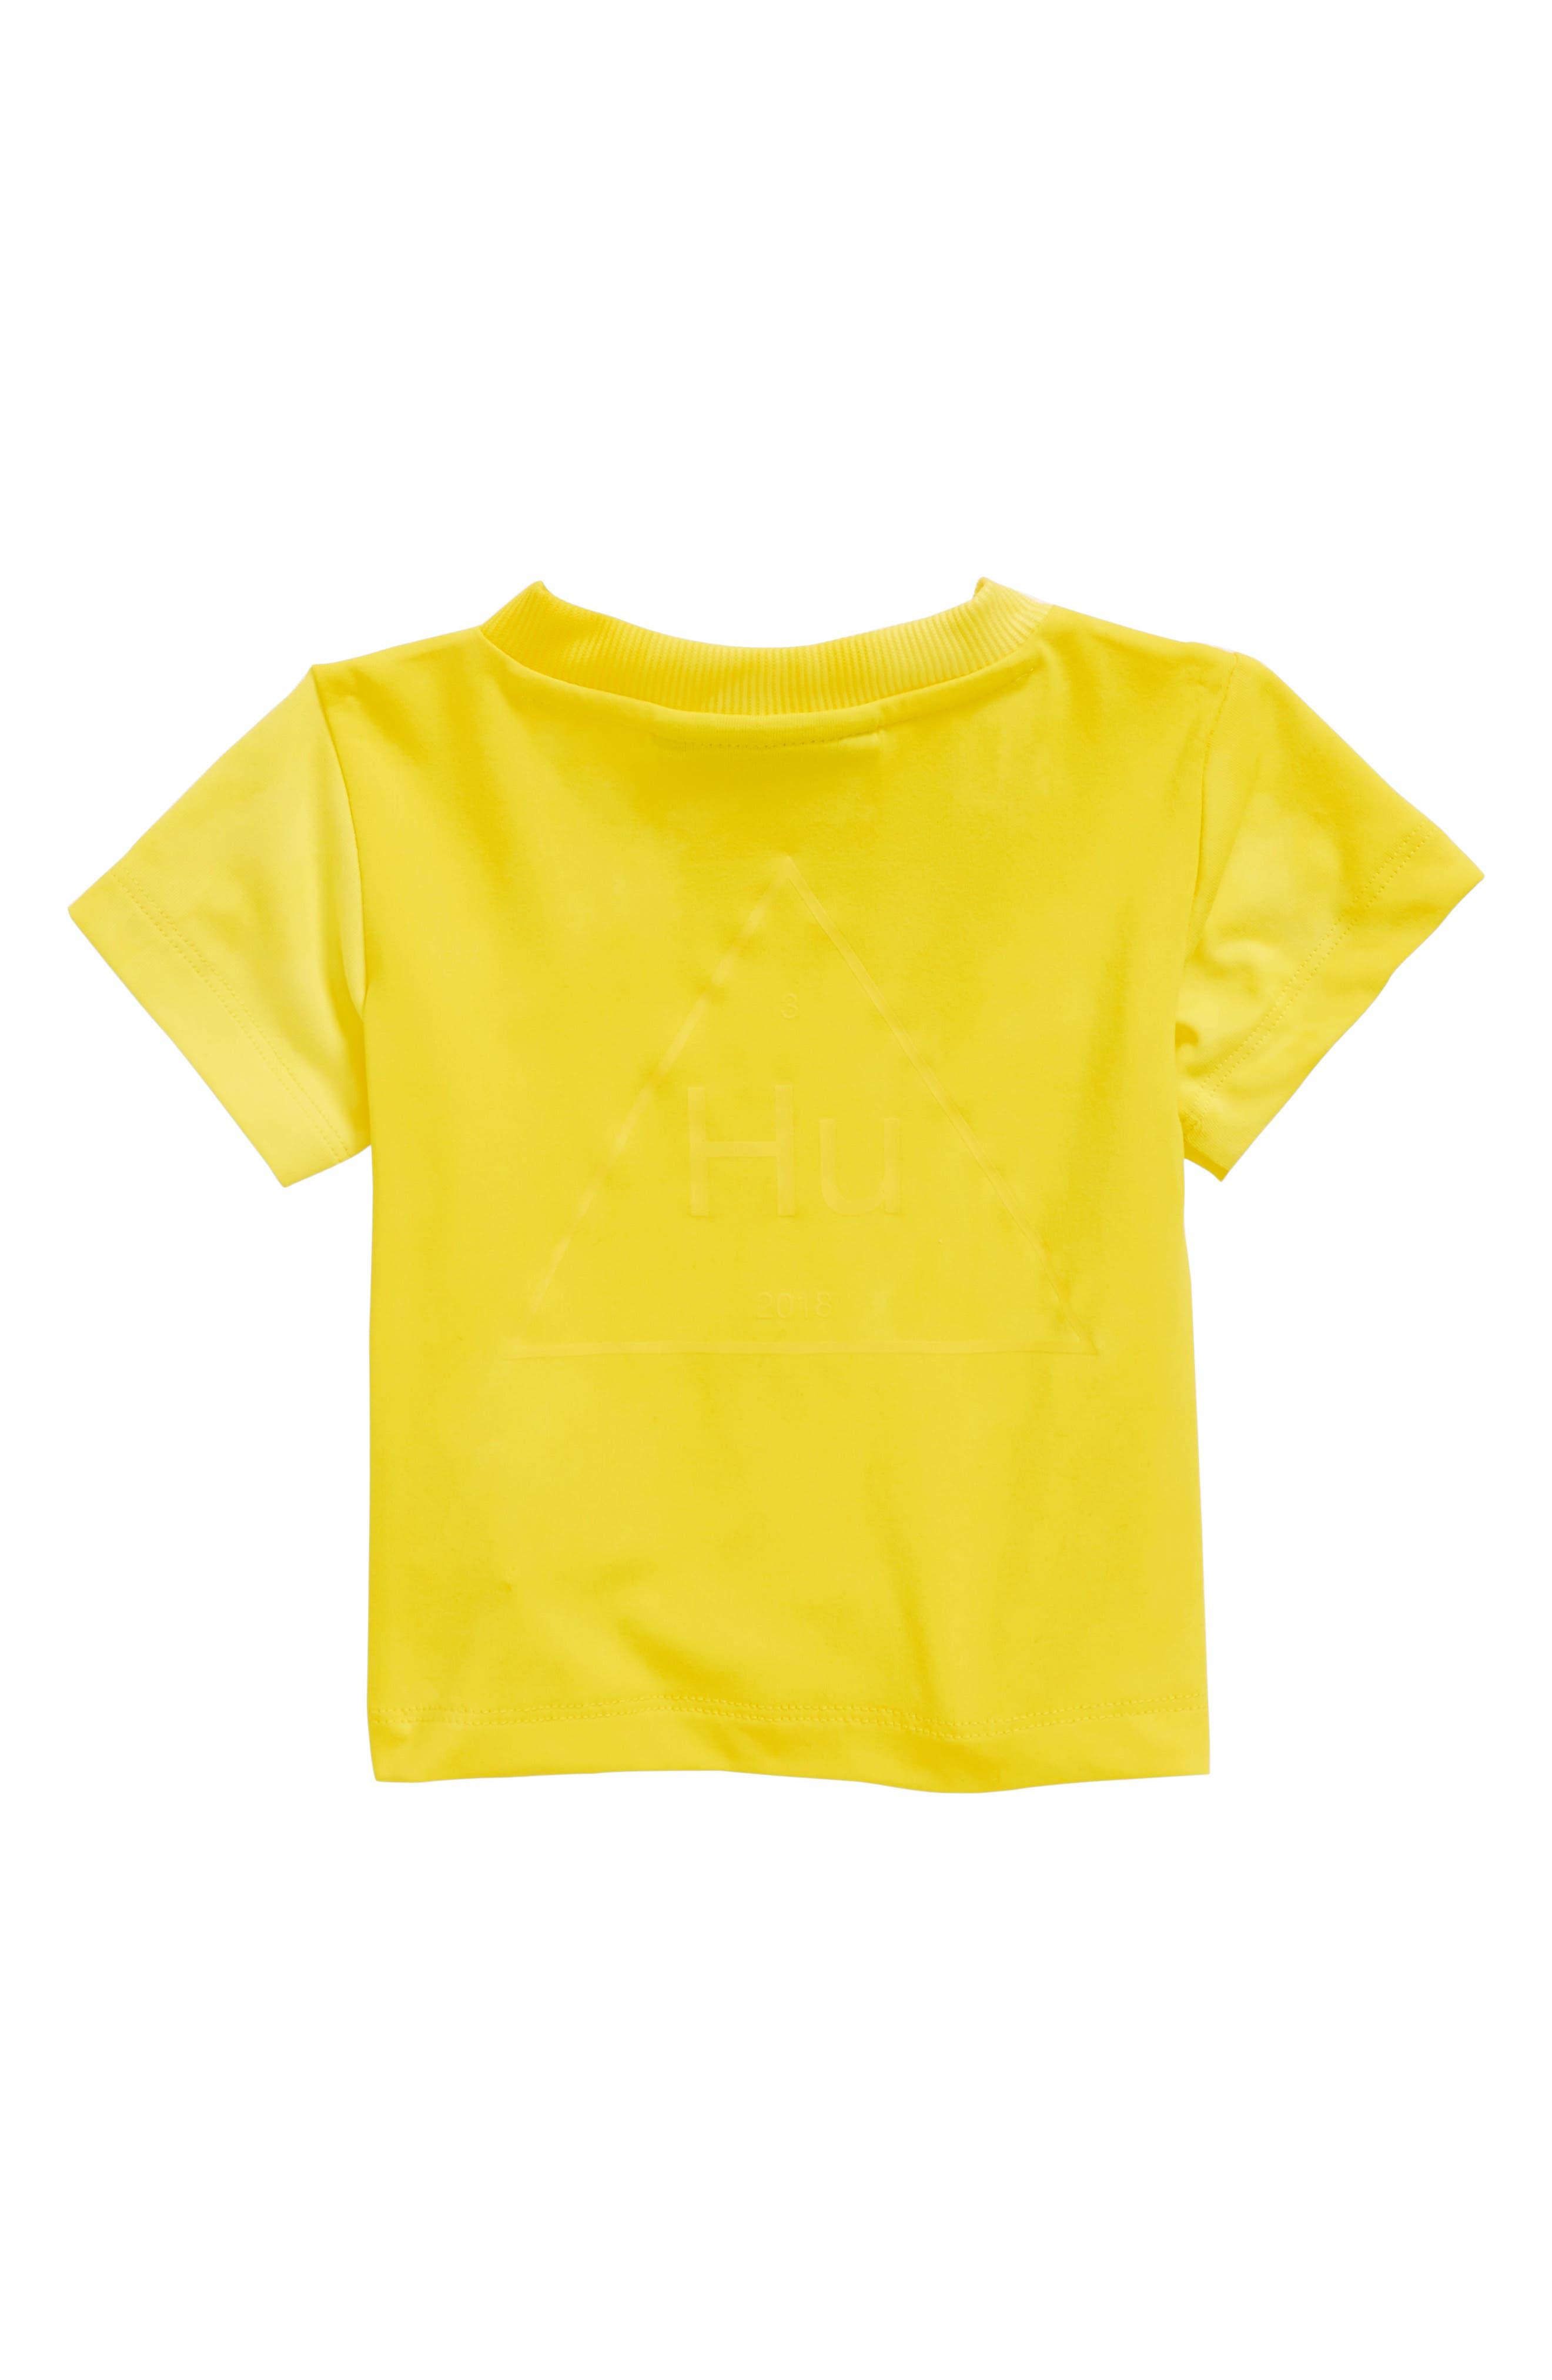 Hu Holi Tee,                             Alternate thumbnail 2, color,                             Yellow / White